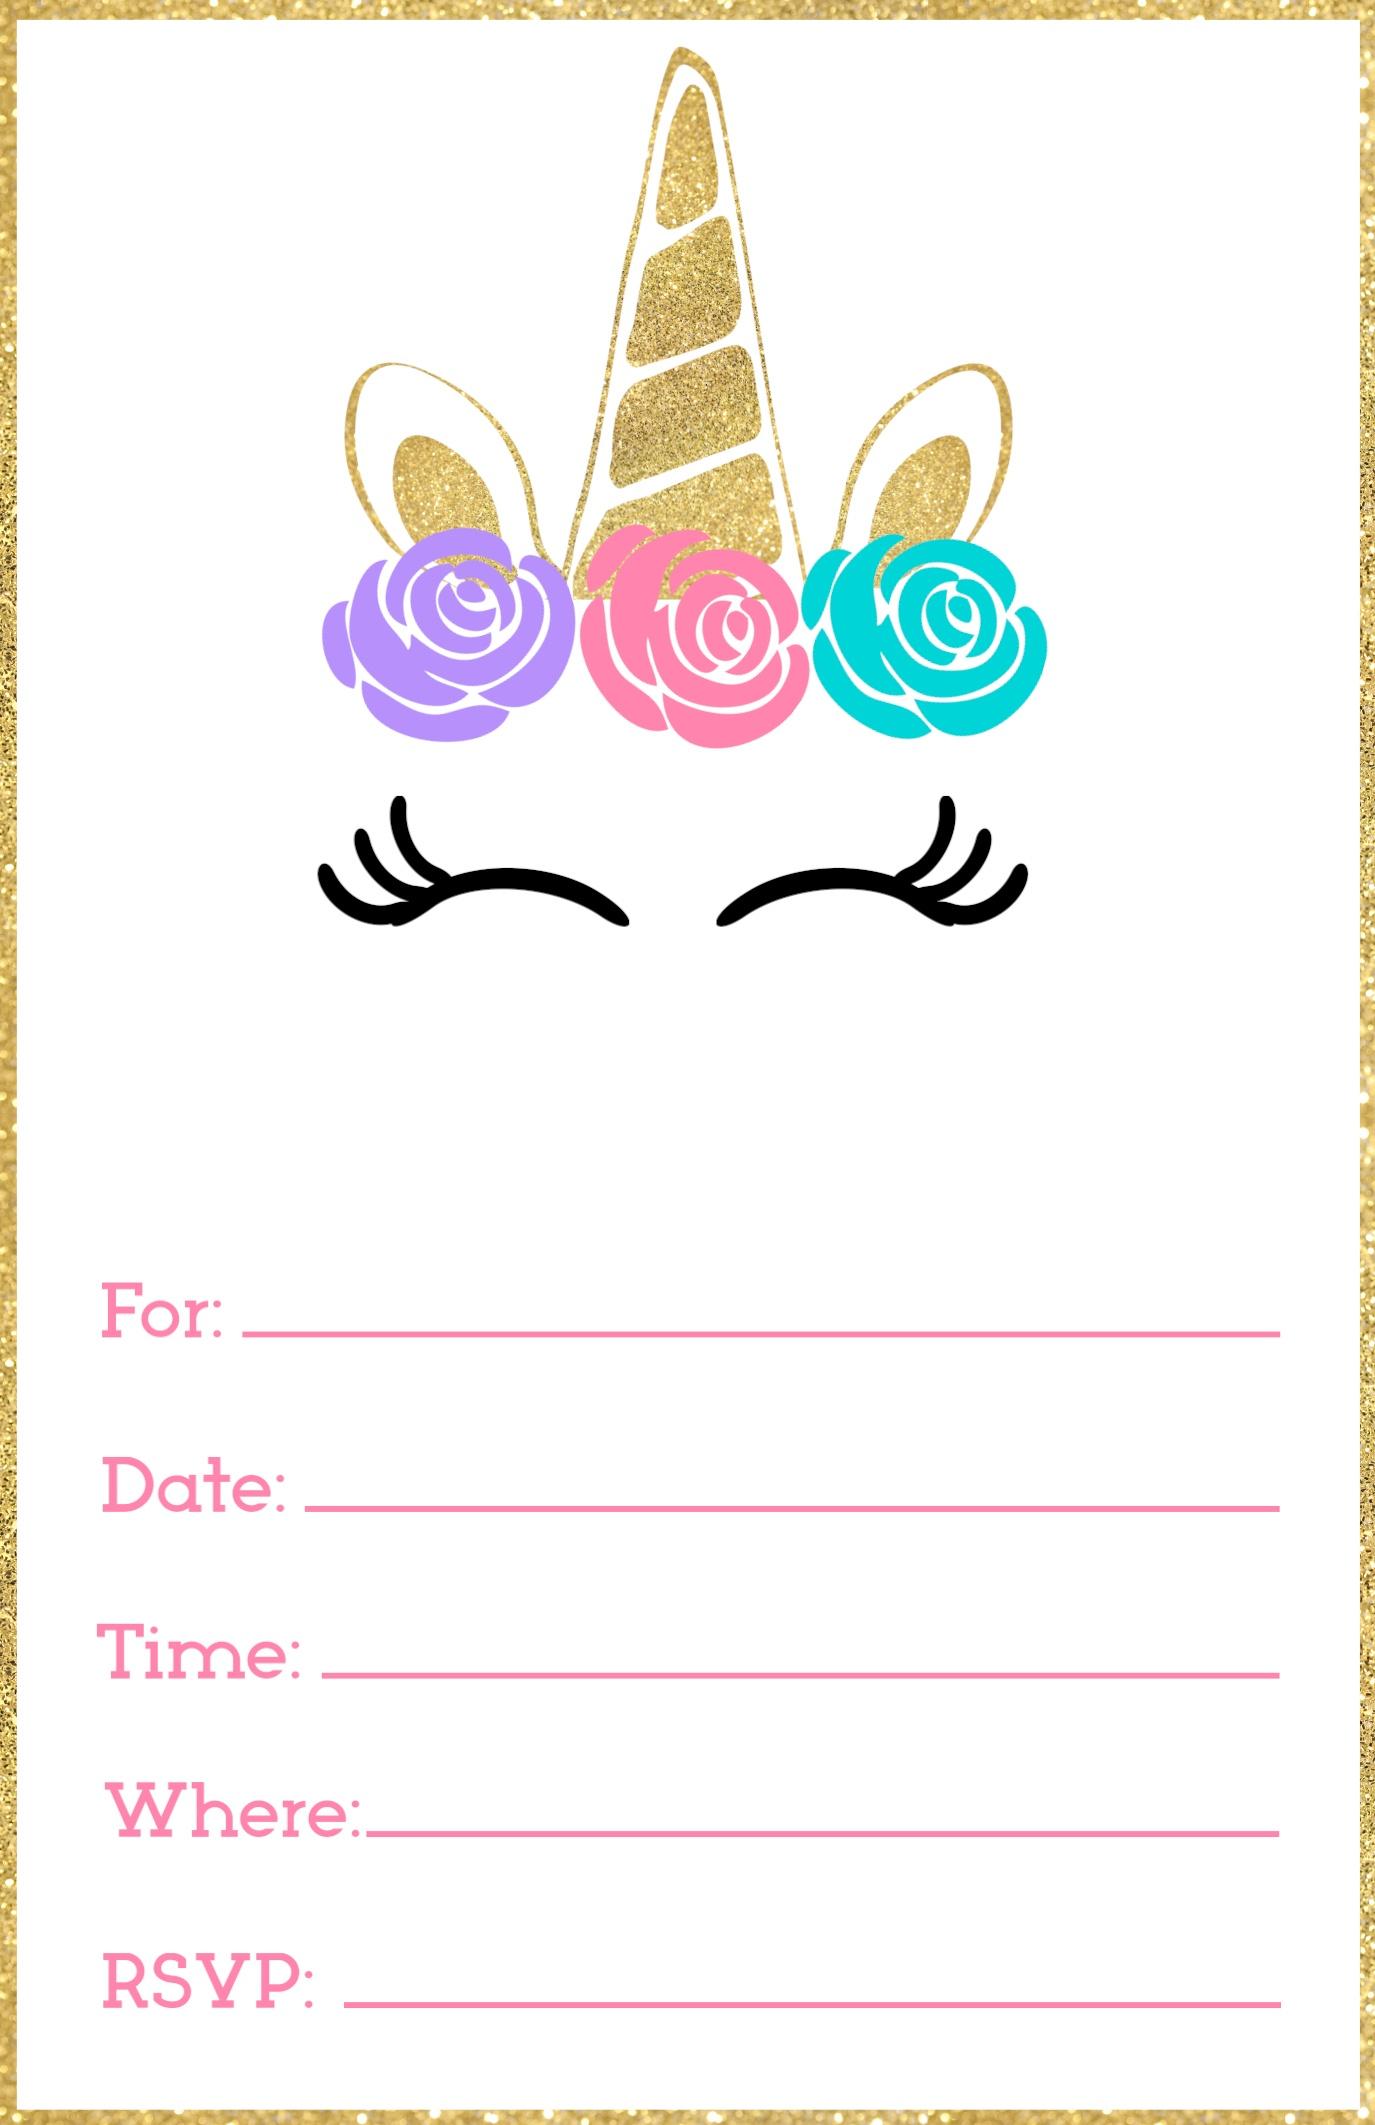 Free Printable Birthday Party Invitations - Granizmondal - Free Printable Birthday Party Invitations